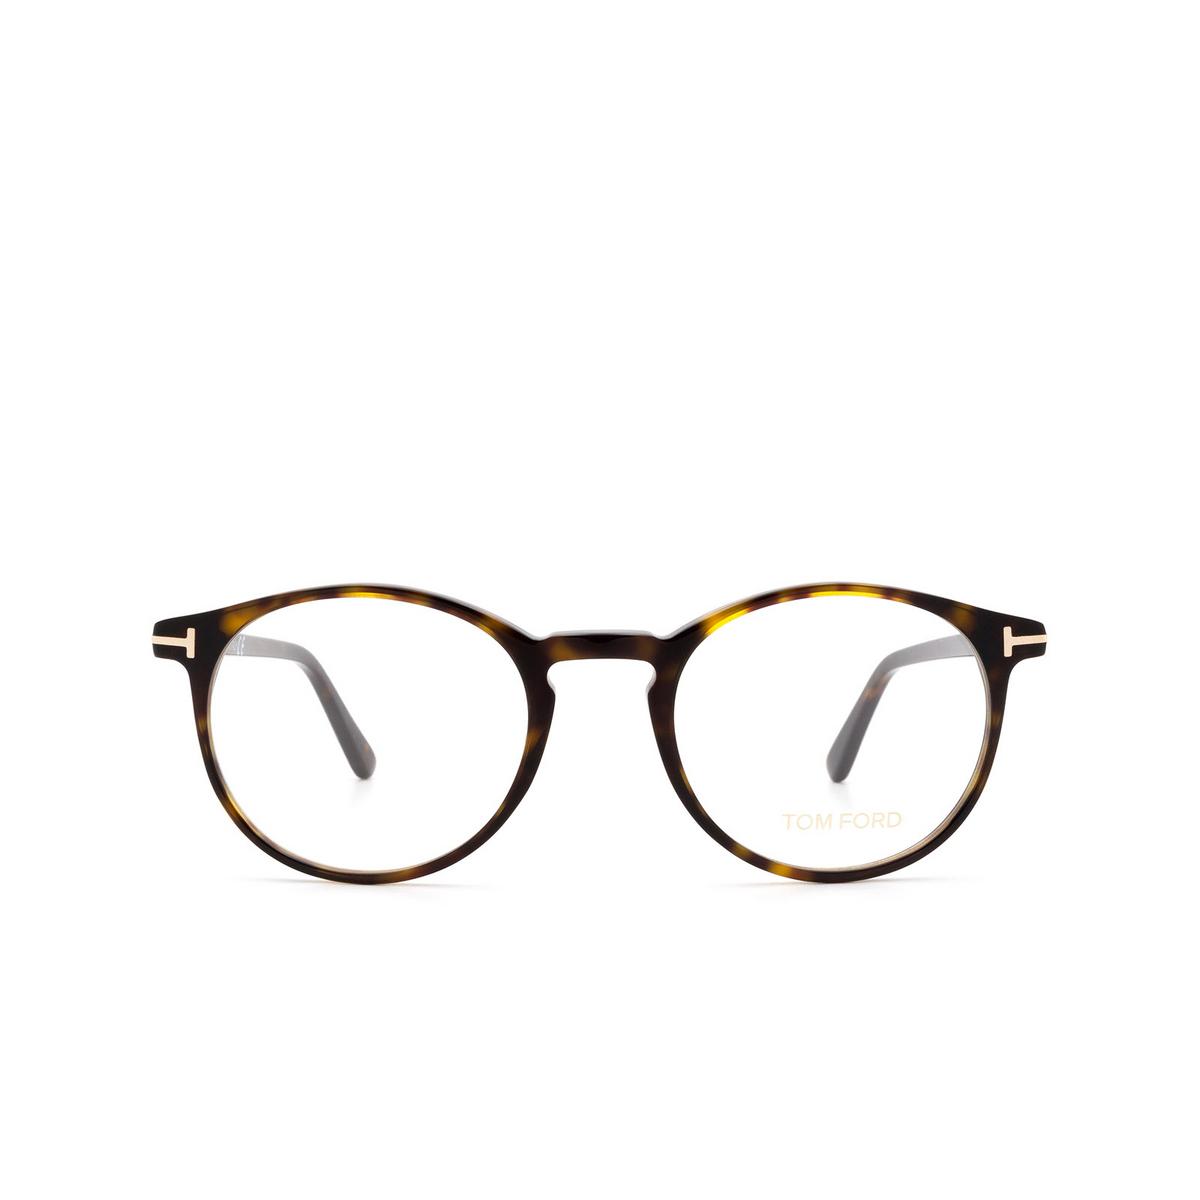 Tom Ford® Round Eyeglasses: FT5294 color Dark Havana 052 - front view.